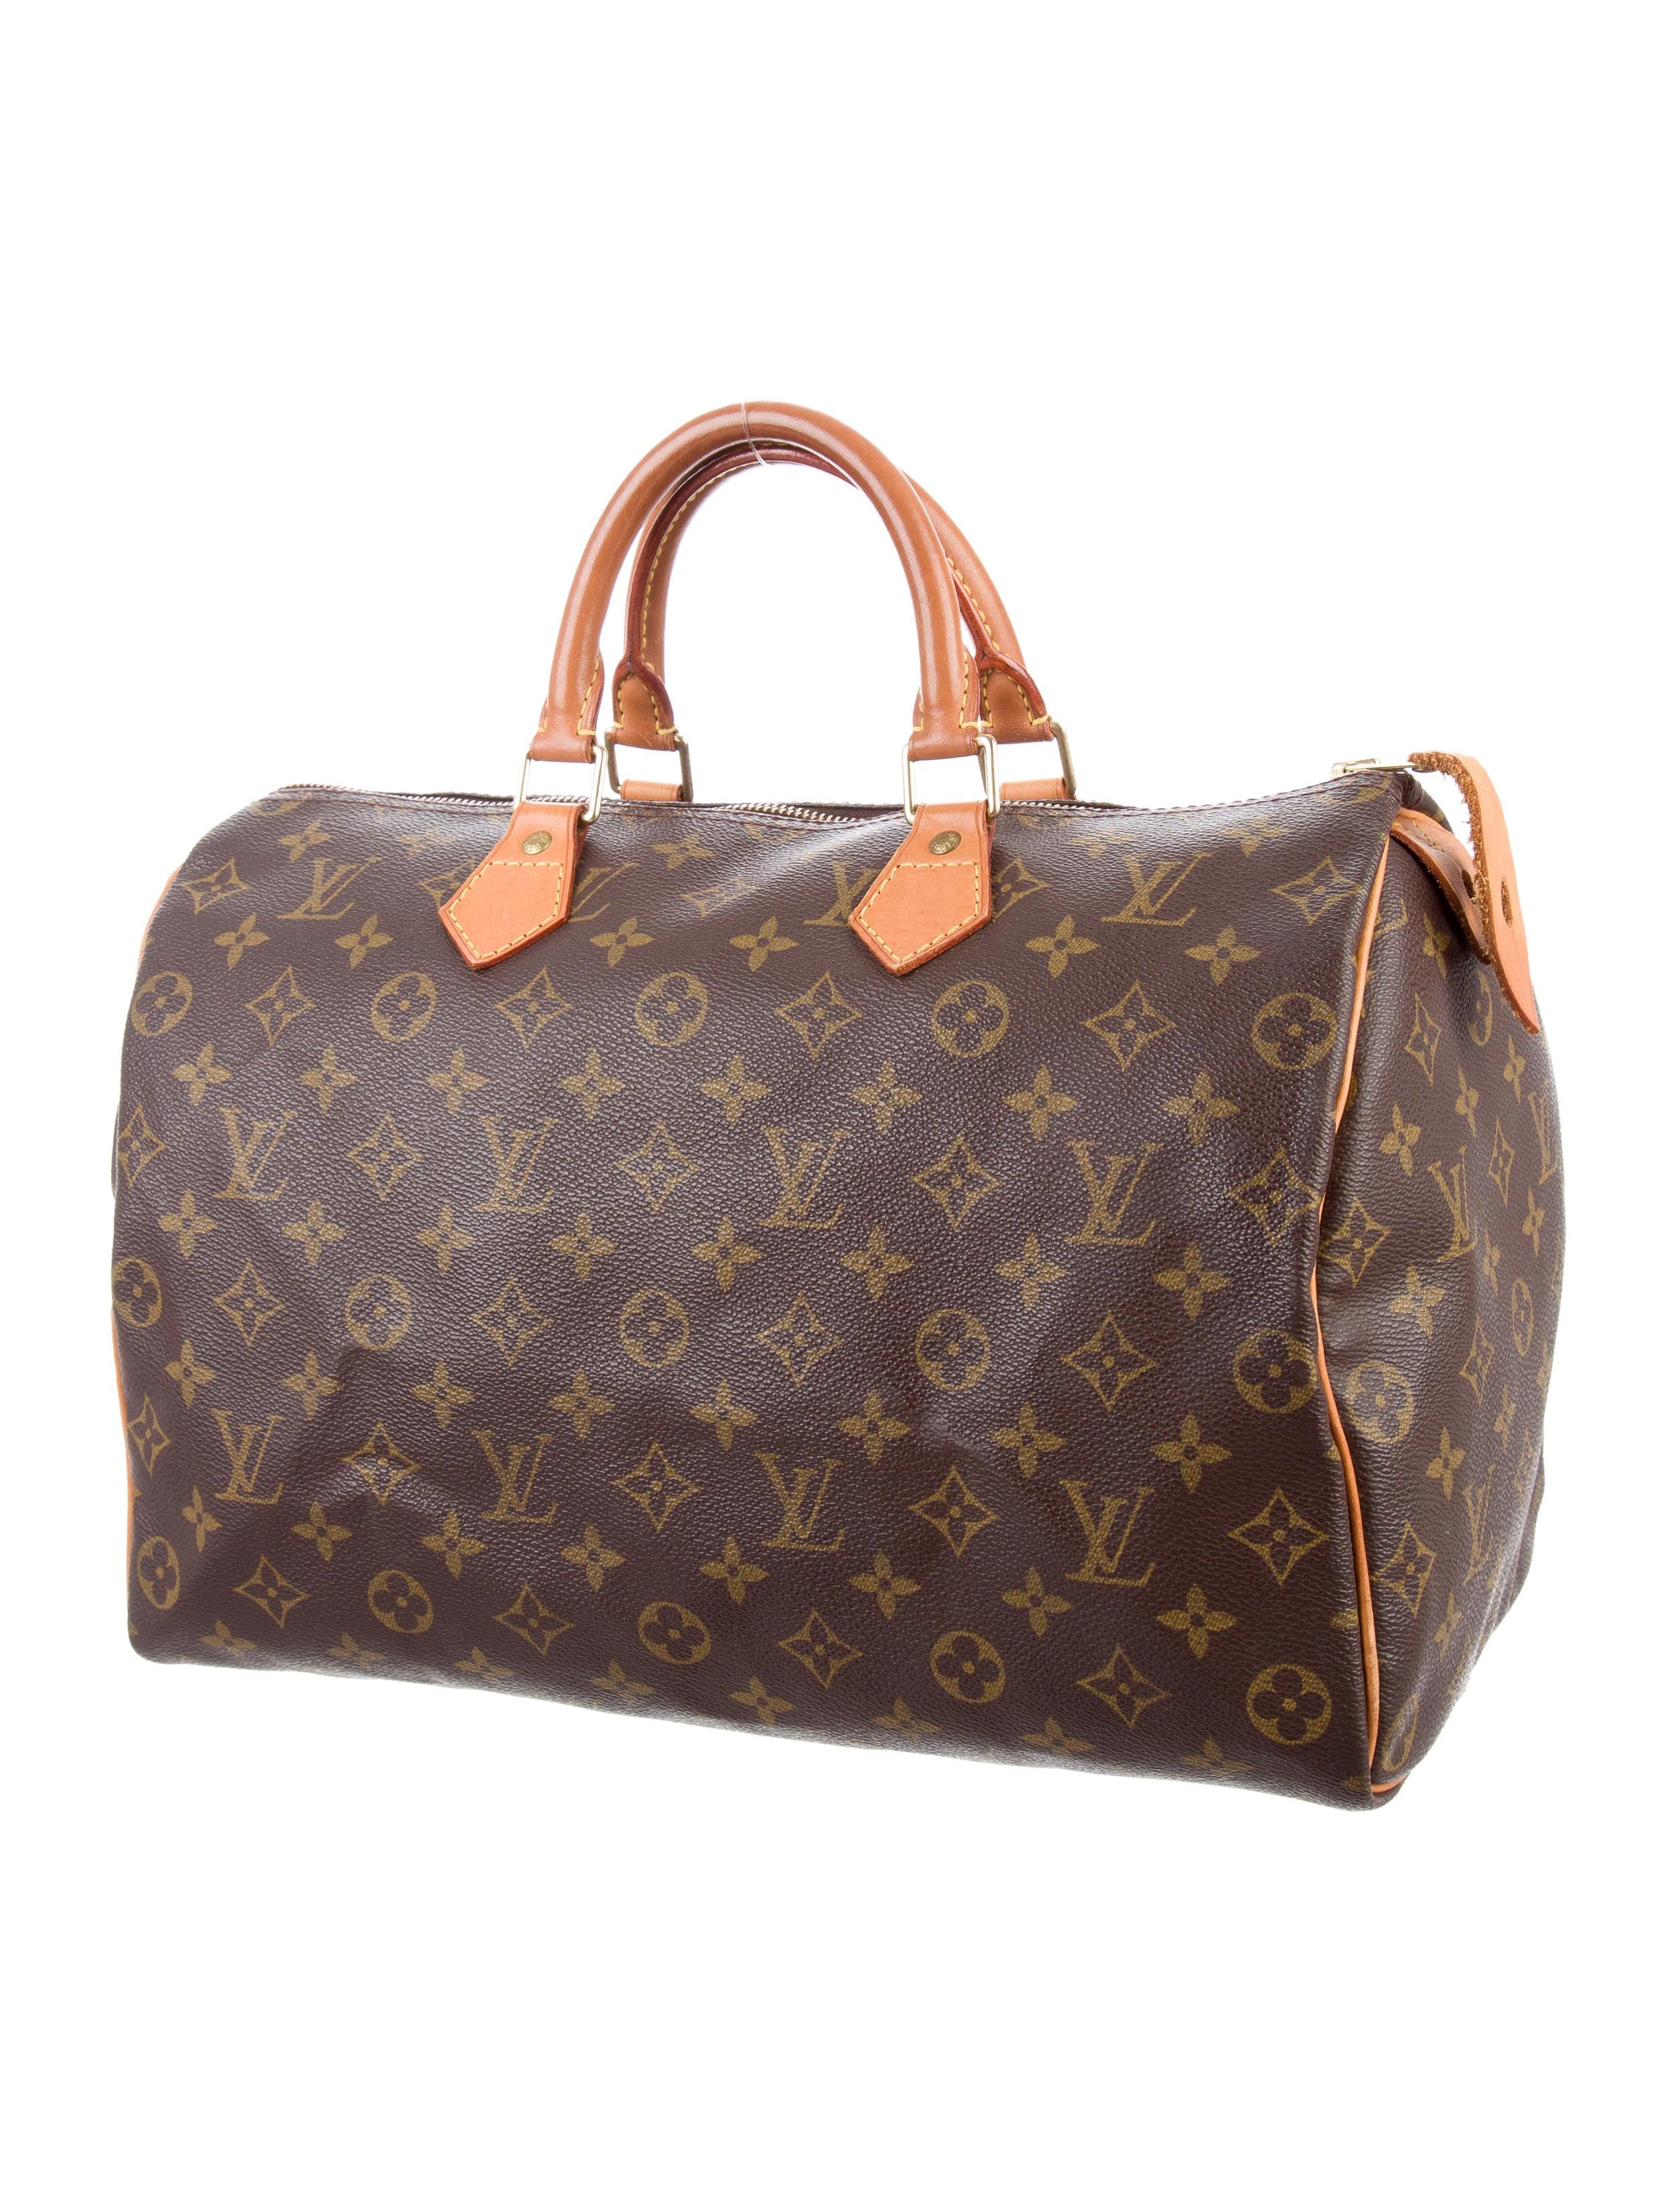 Louis vuitton monogram speedy 35 handbags lou119014 for Louis vuitton miroir speedy 35